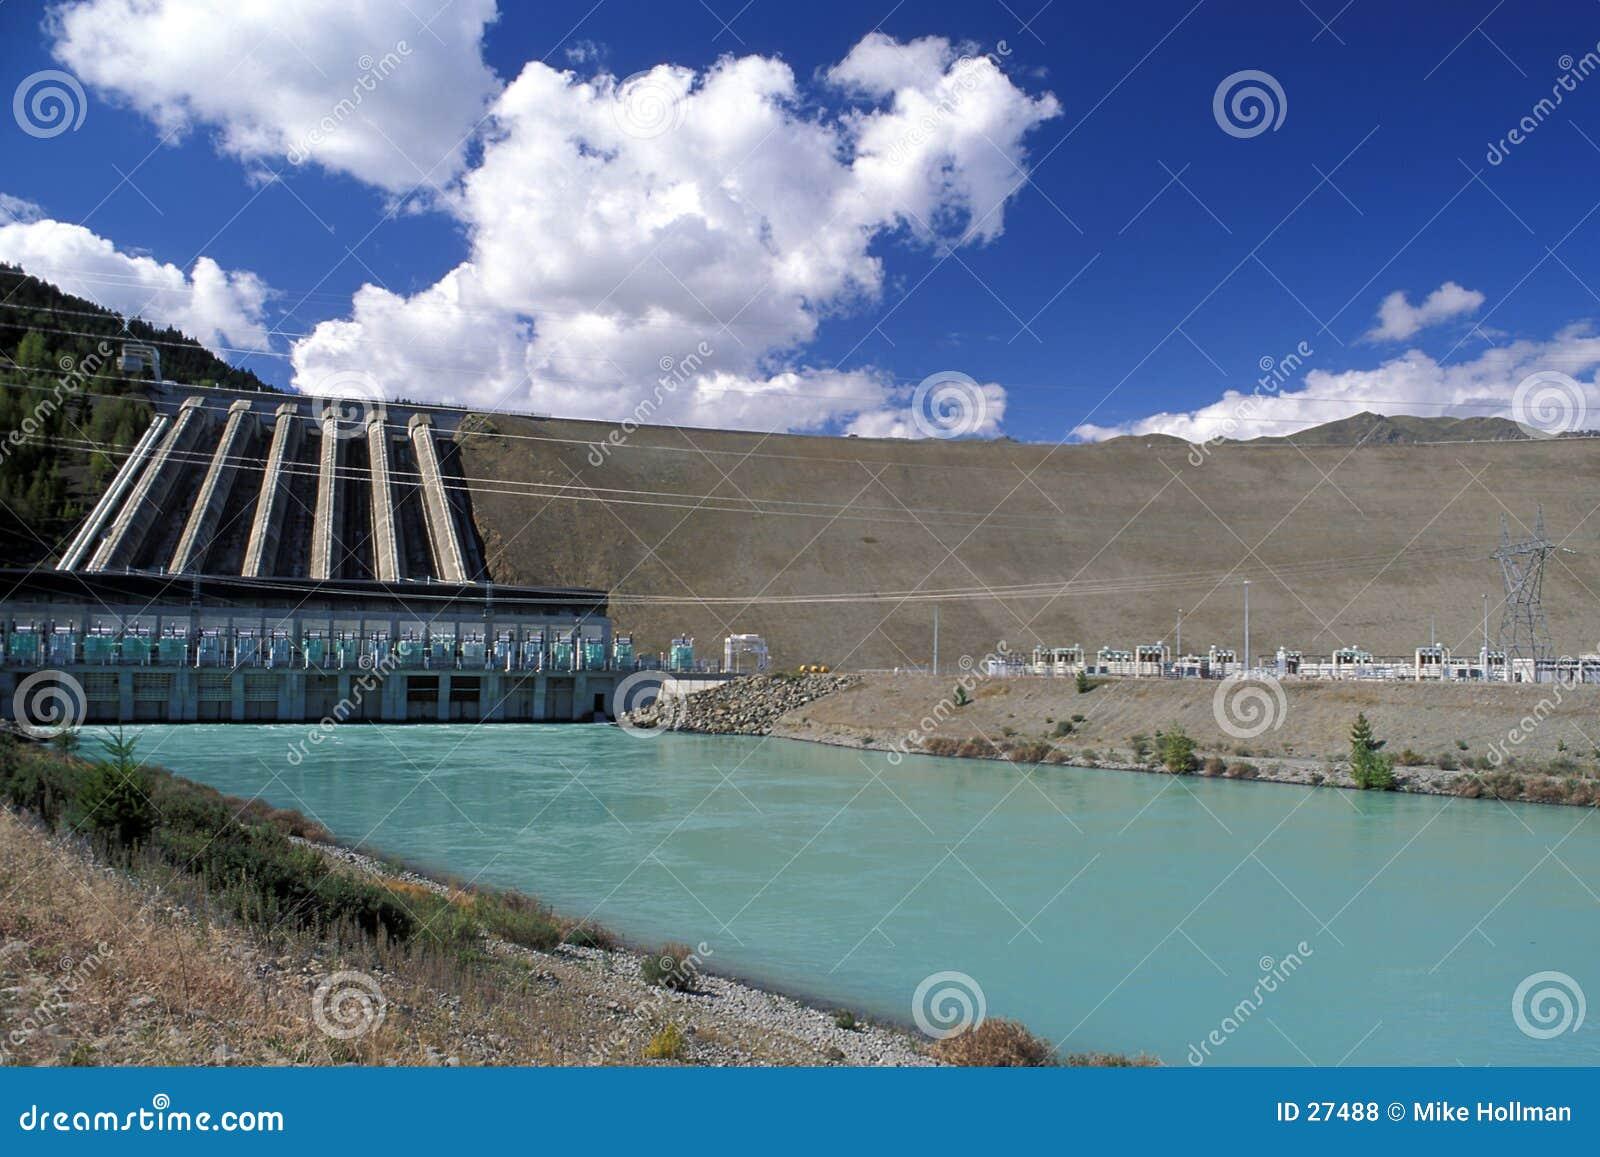 Grobelny nowe Zelandii wody